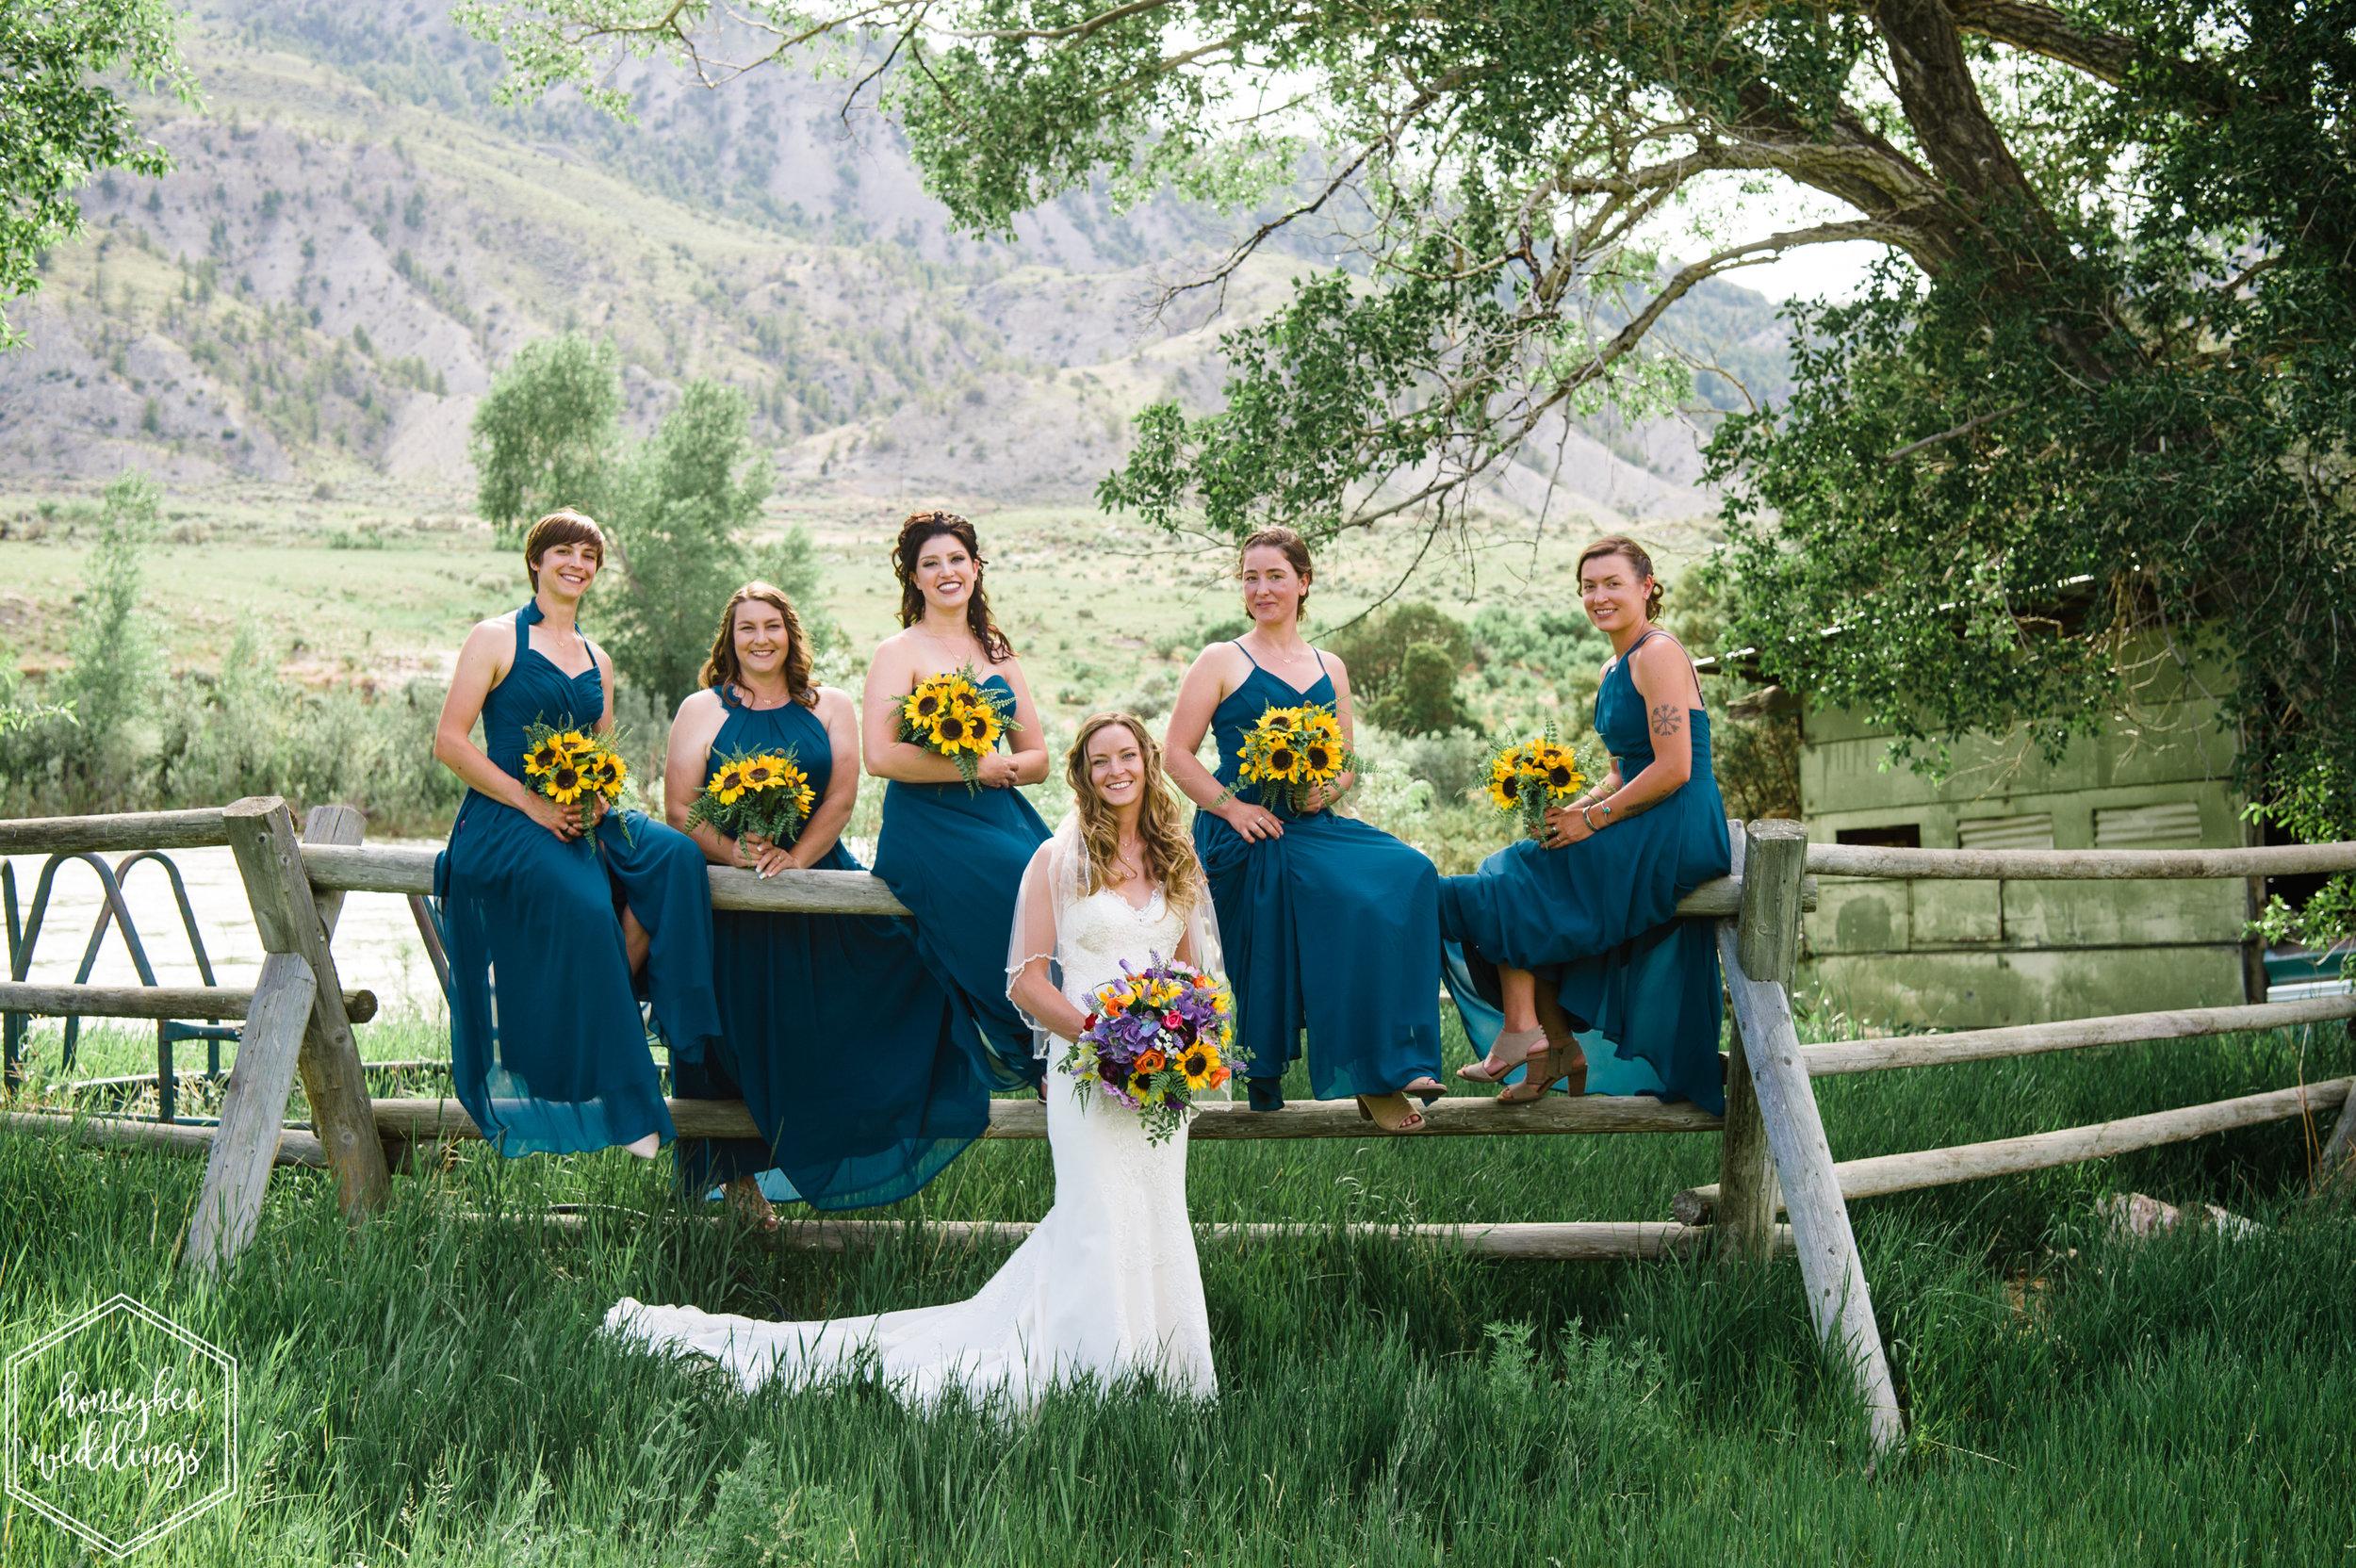 102Yellowstone National Park Wedding_Montana Wedding Photographer_Honeybee Weddings_Shannon & Jonathan_June 29, 2019-555.jpg